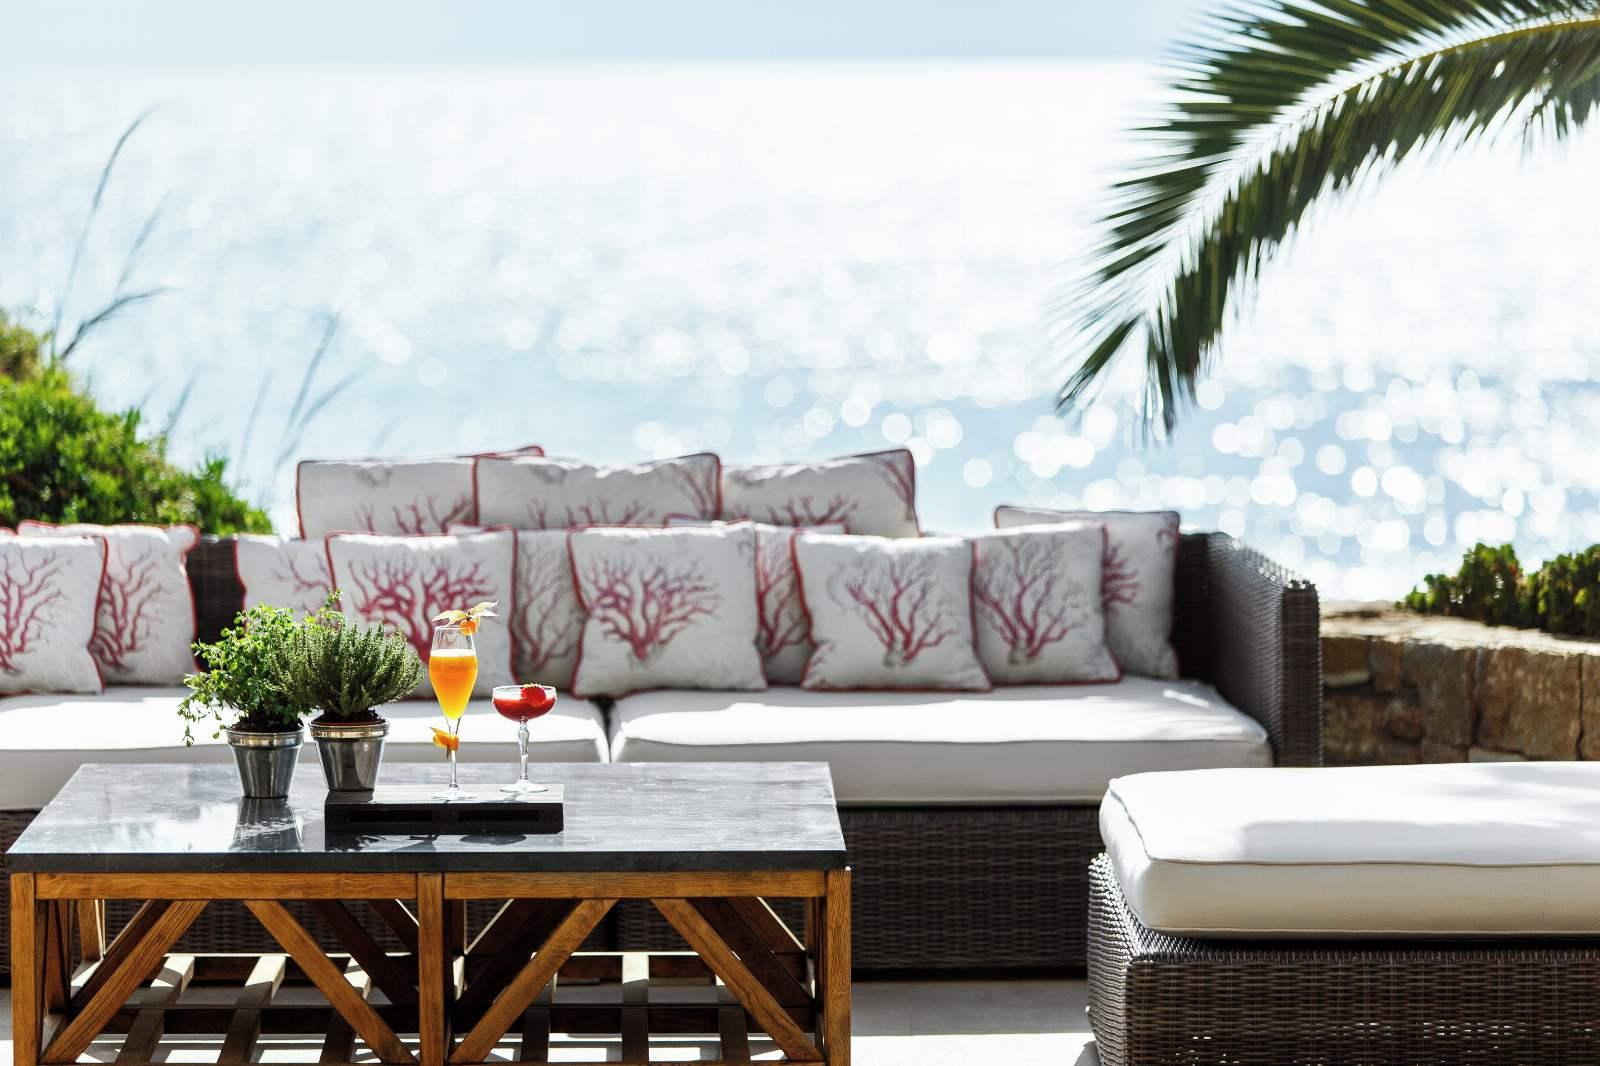 Sani Resort - Cabana Club Cocktails